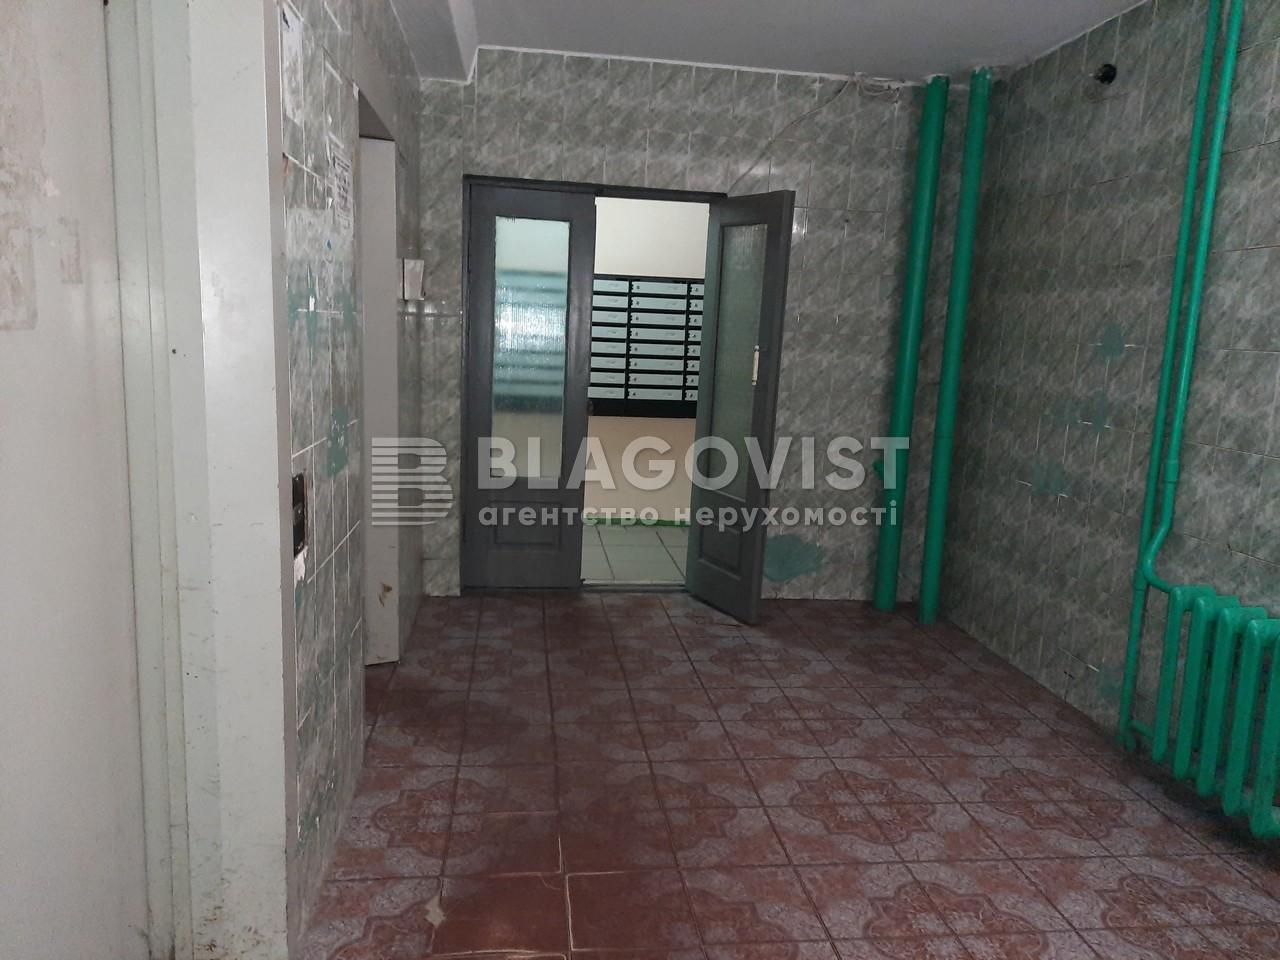 Квартира P-29771, Милославская, 31б, Киев - Фото 31